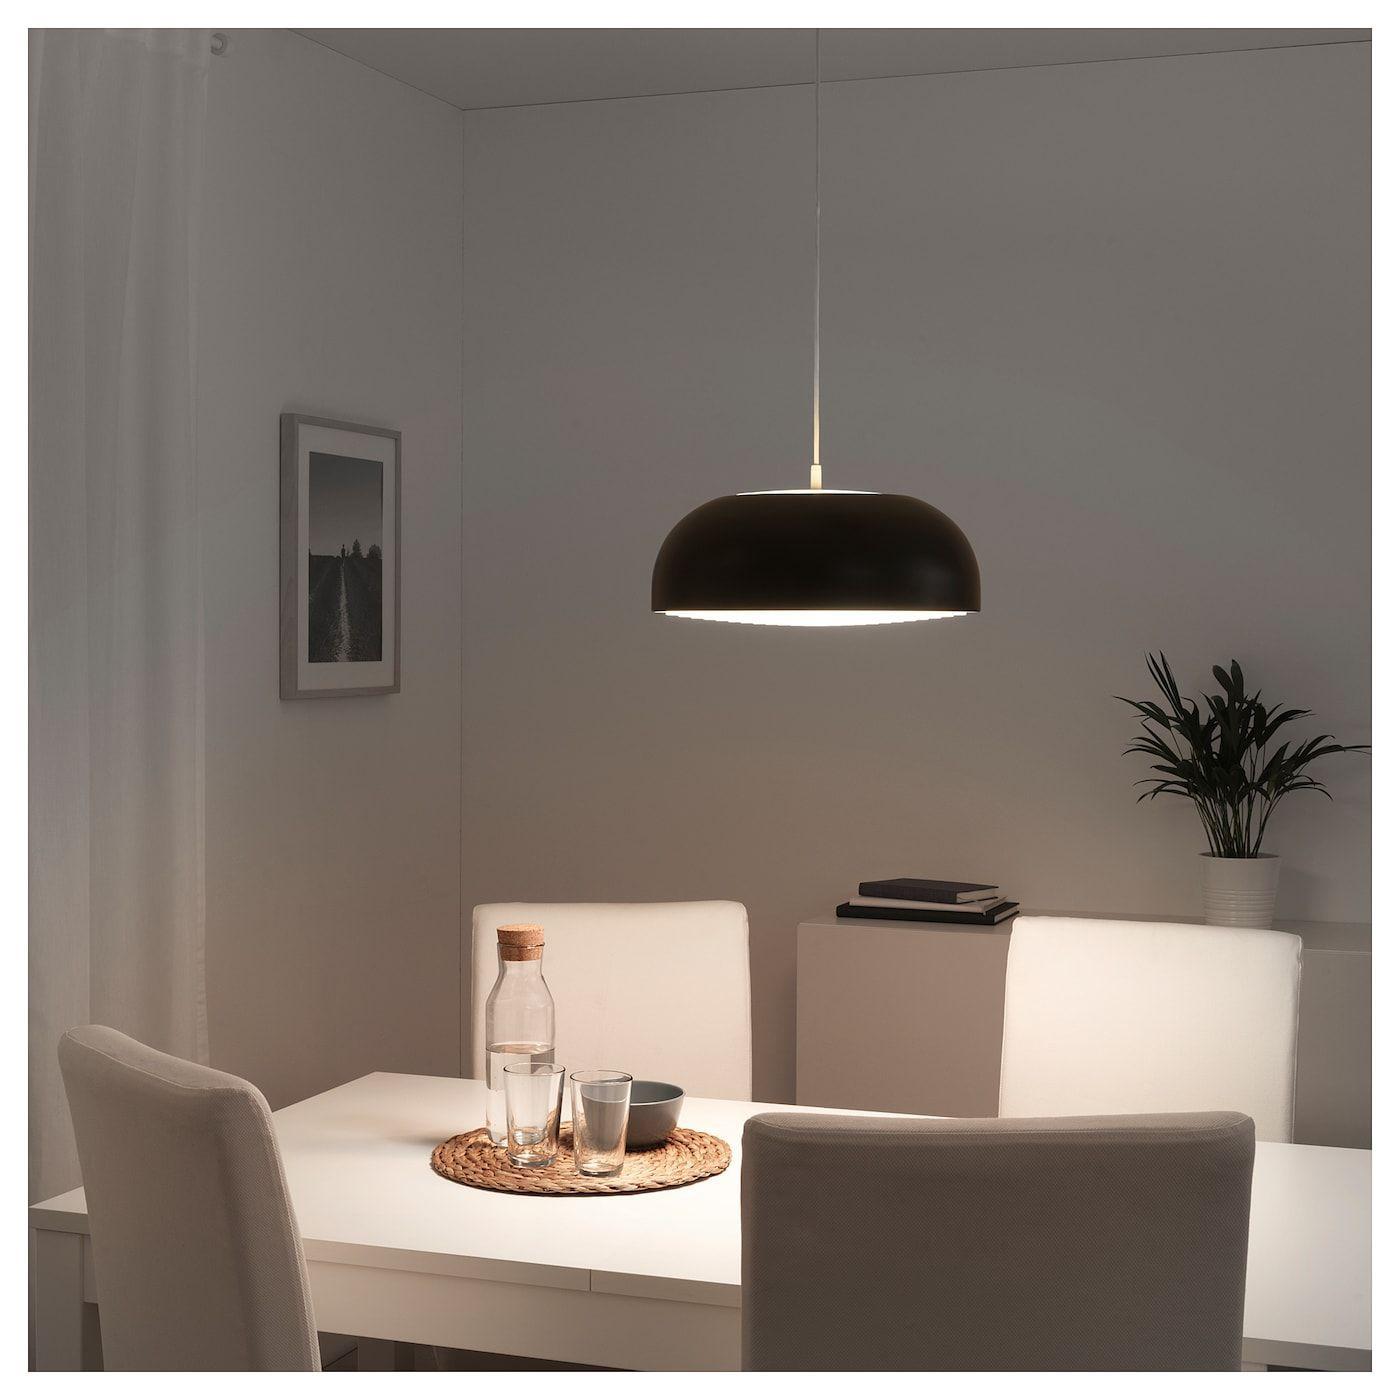 NYMÅNE Pendant lamp anthracite IKEA in 2020 | Pendant